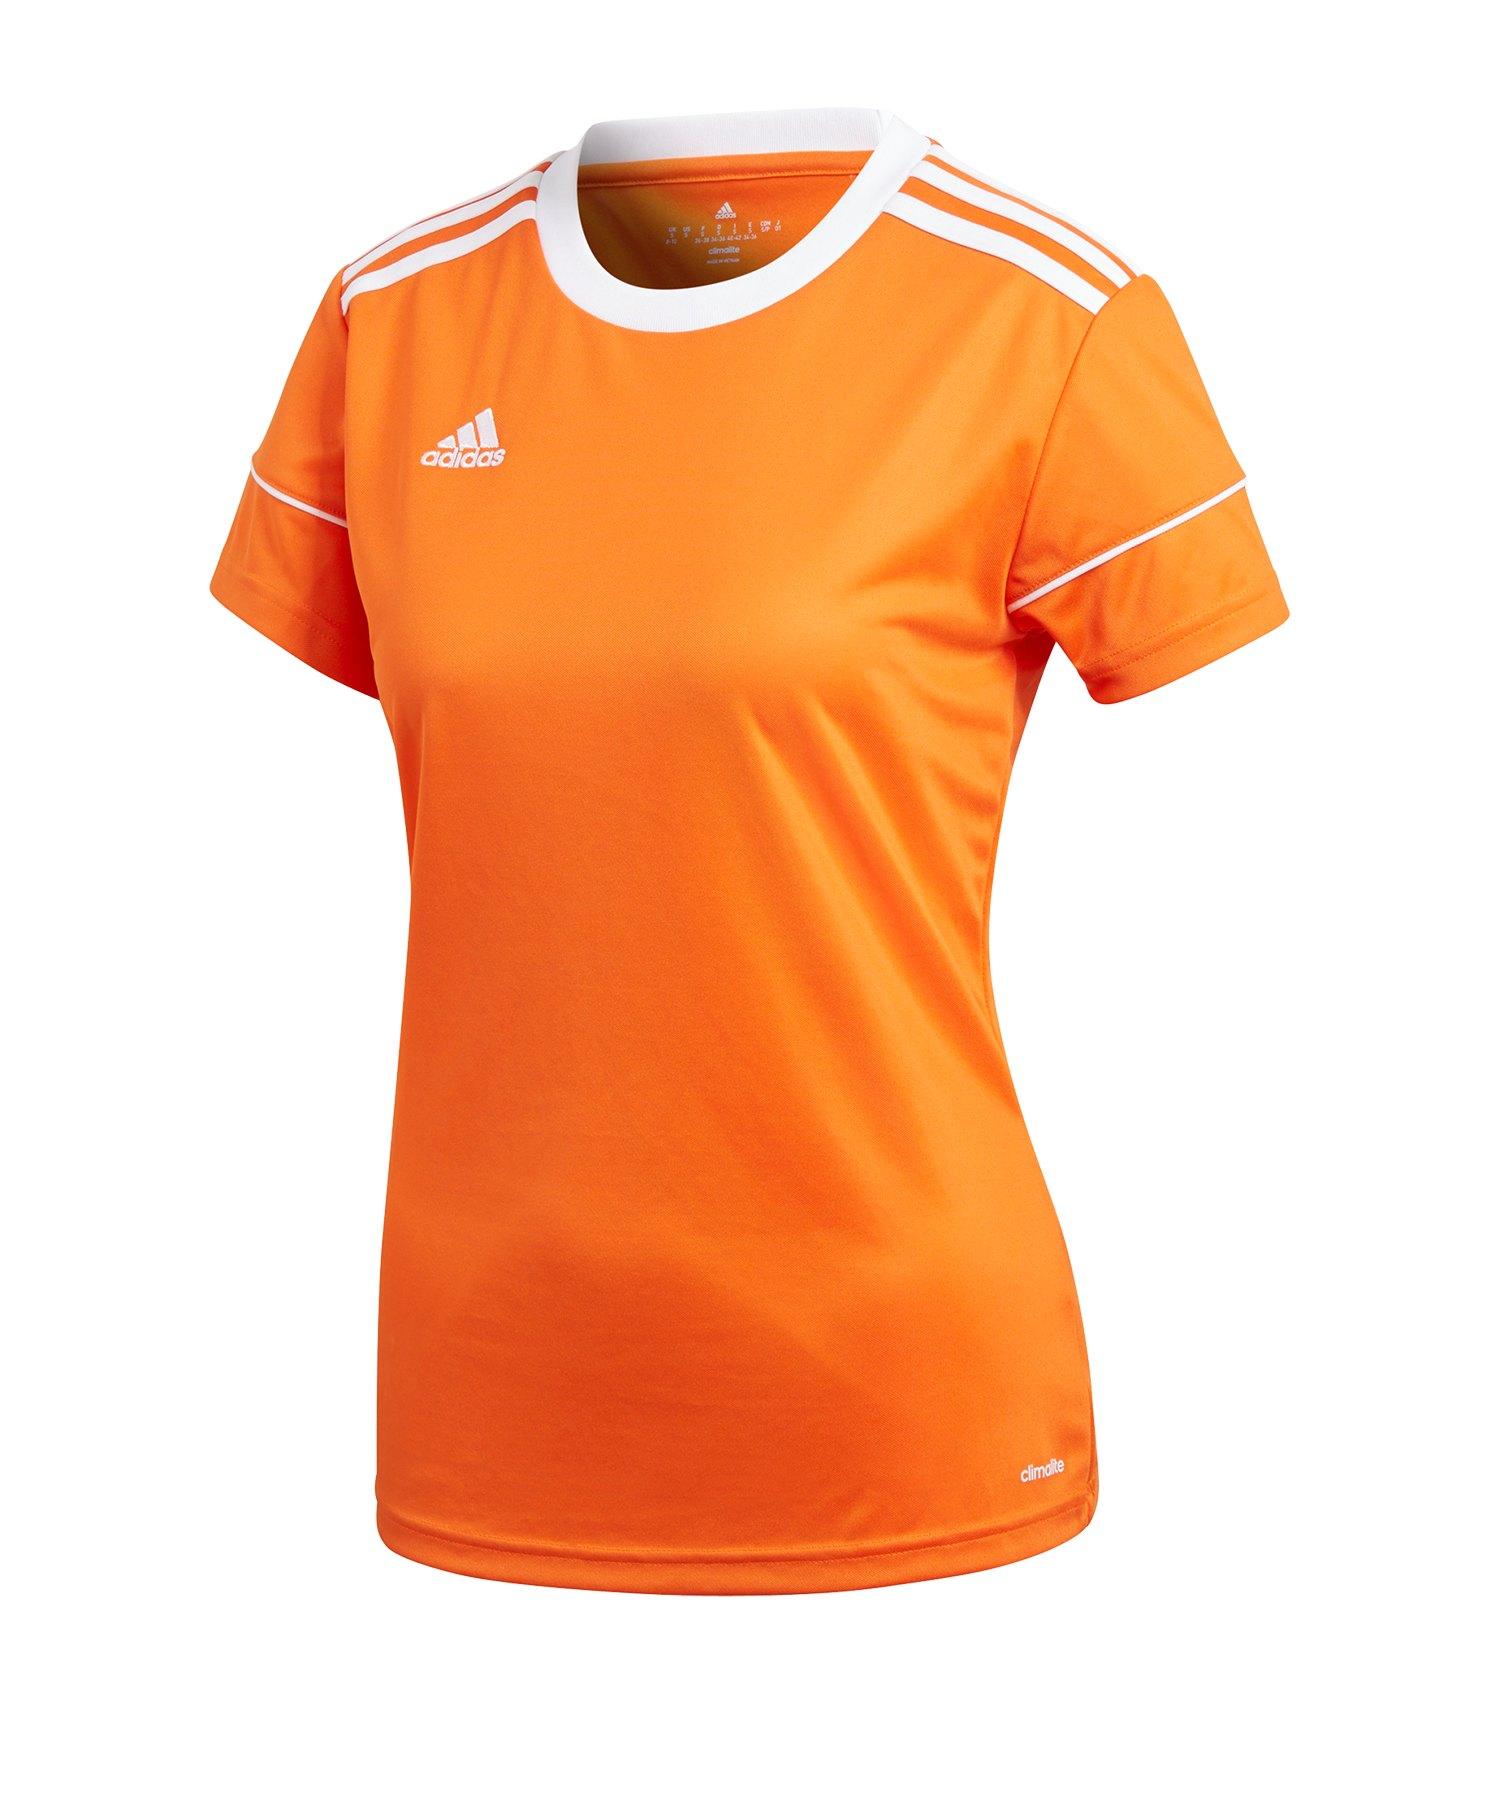 adidas Squadra 17 Trikot Damen Orange - orange